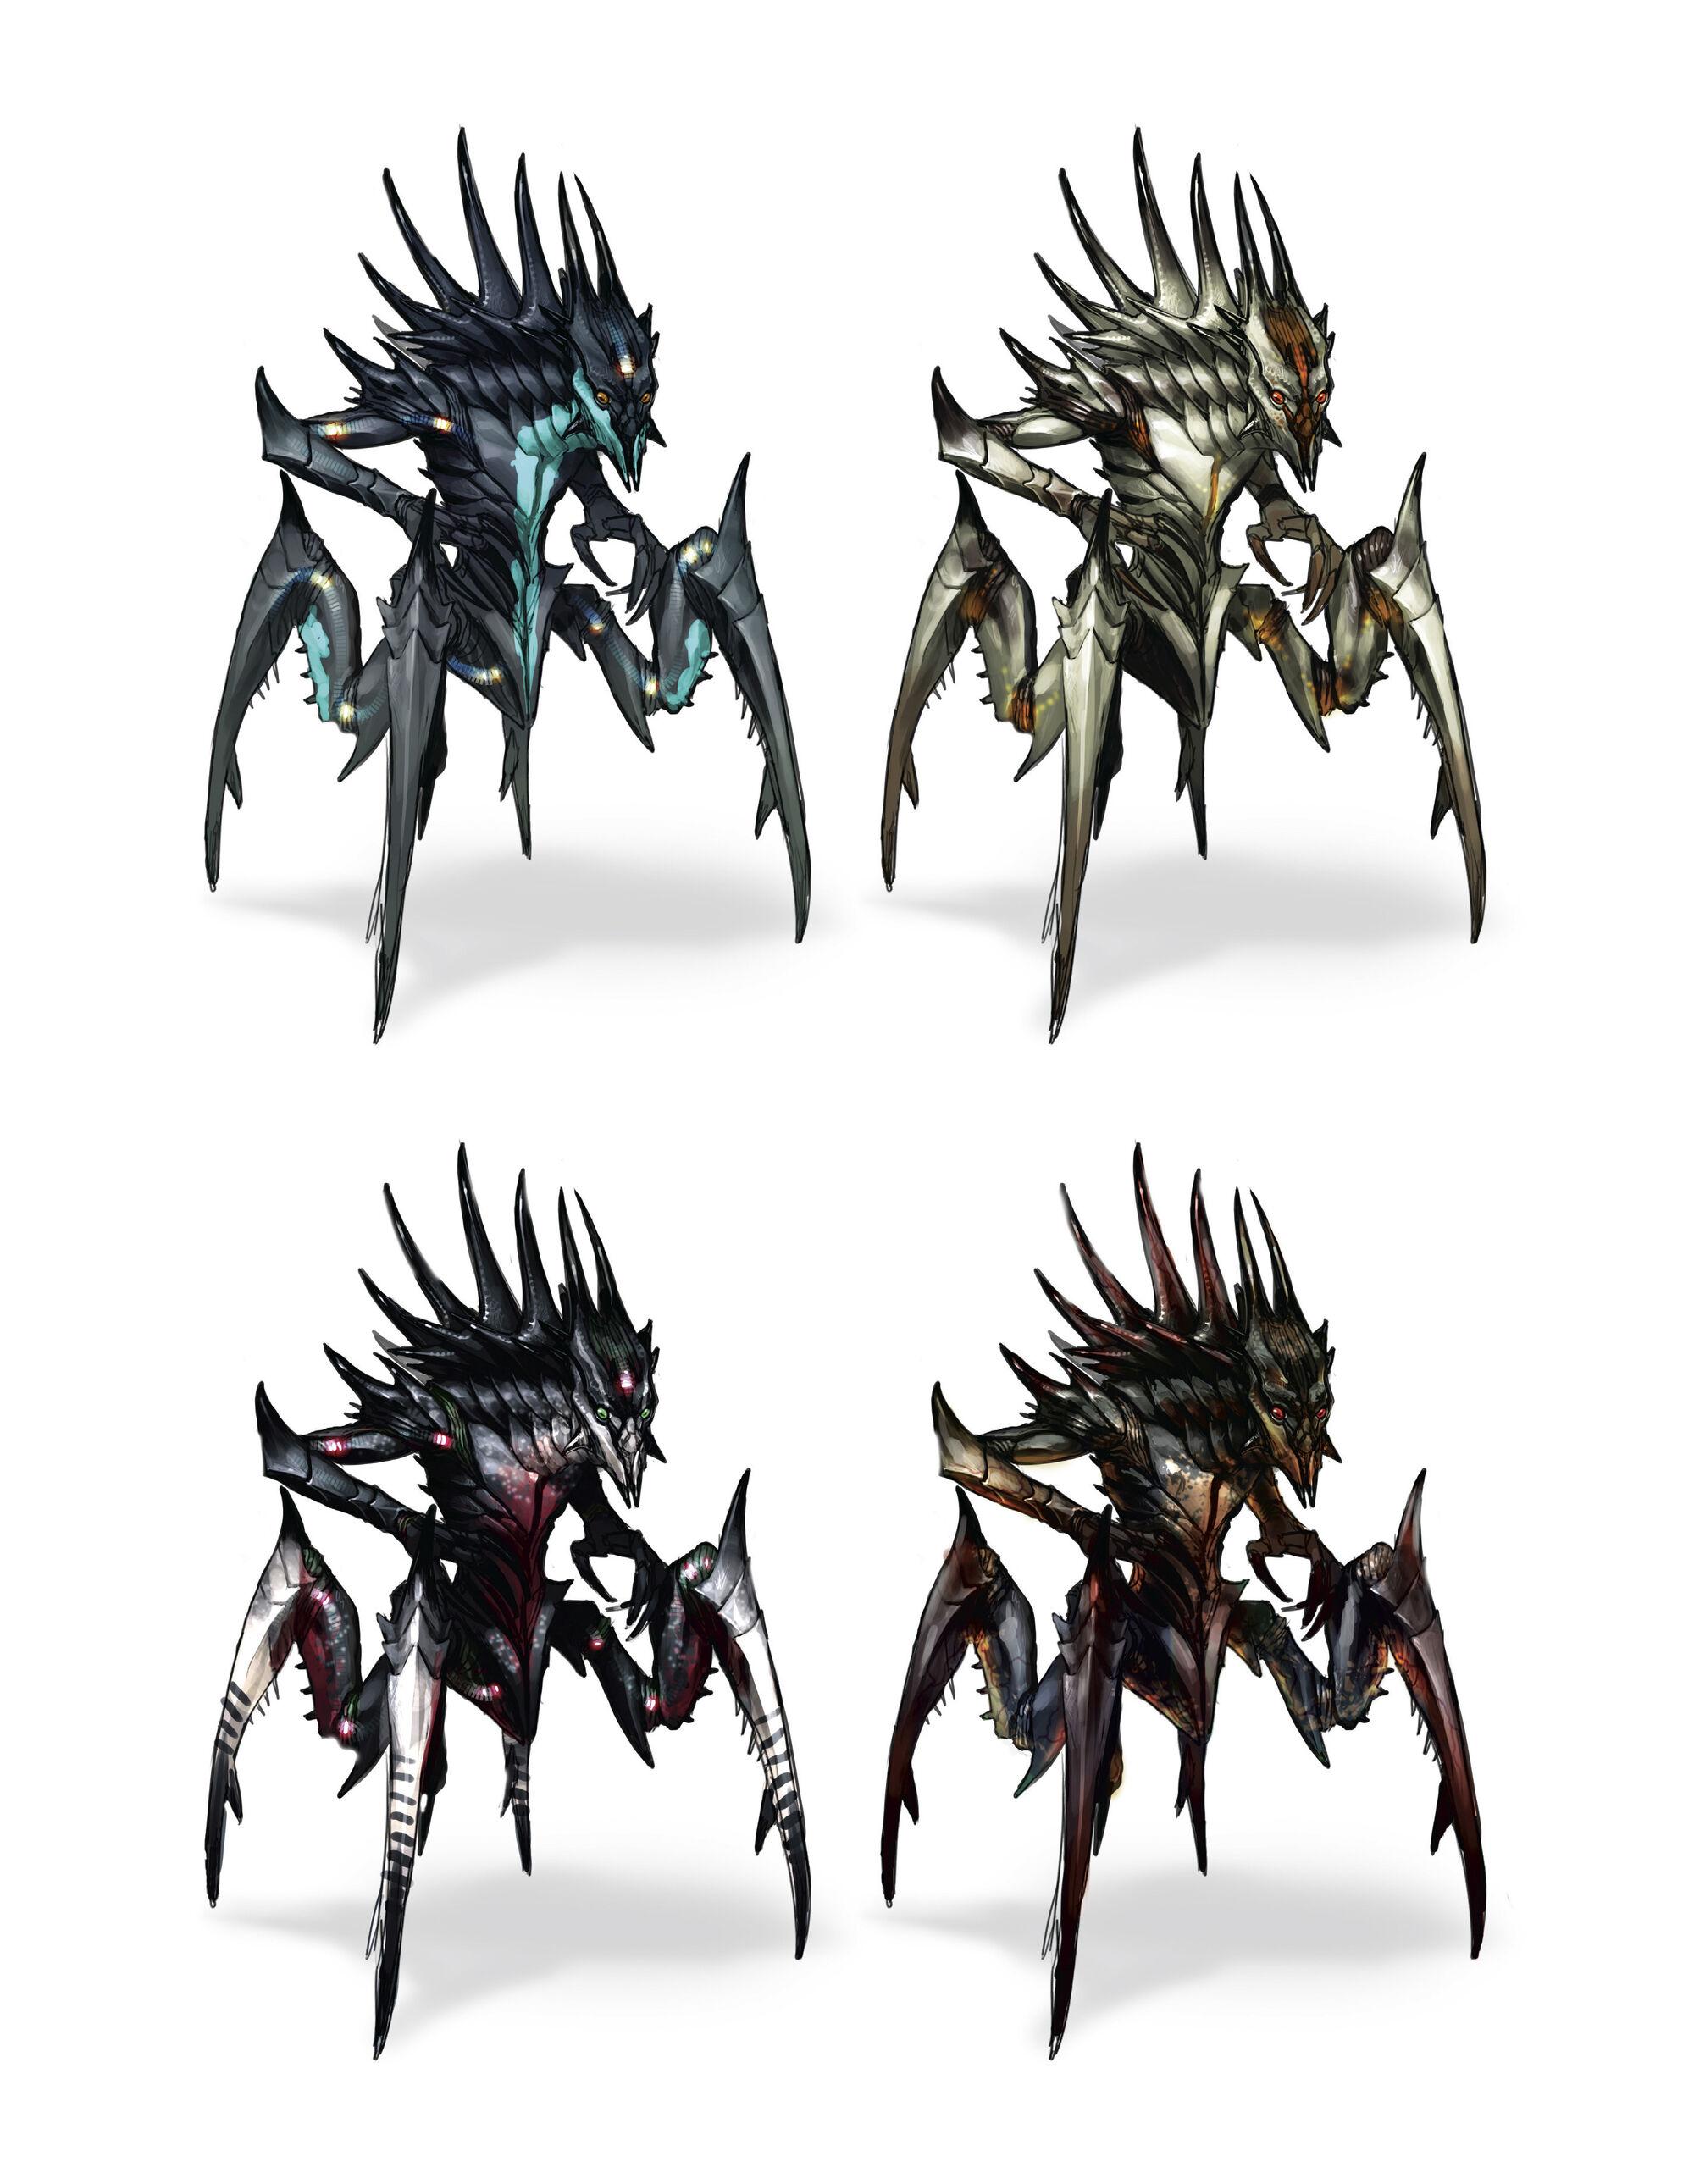 Chryssalid XCOM 2